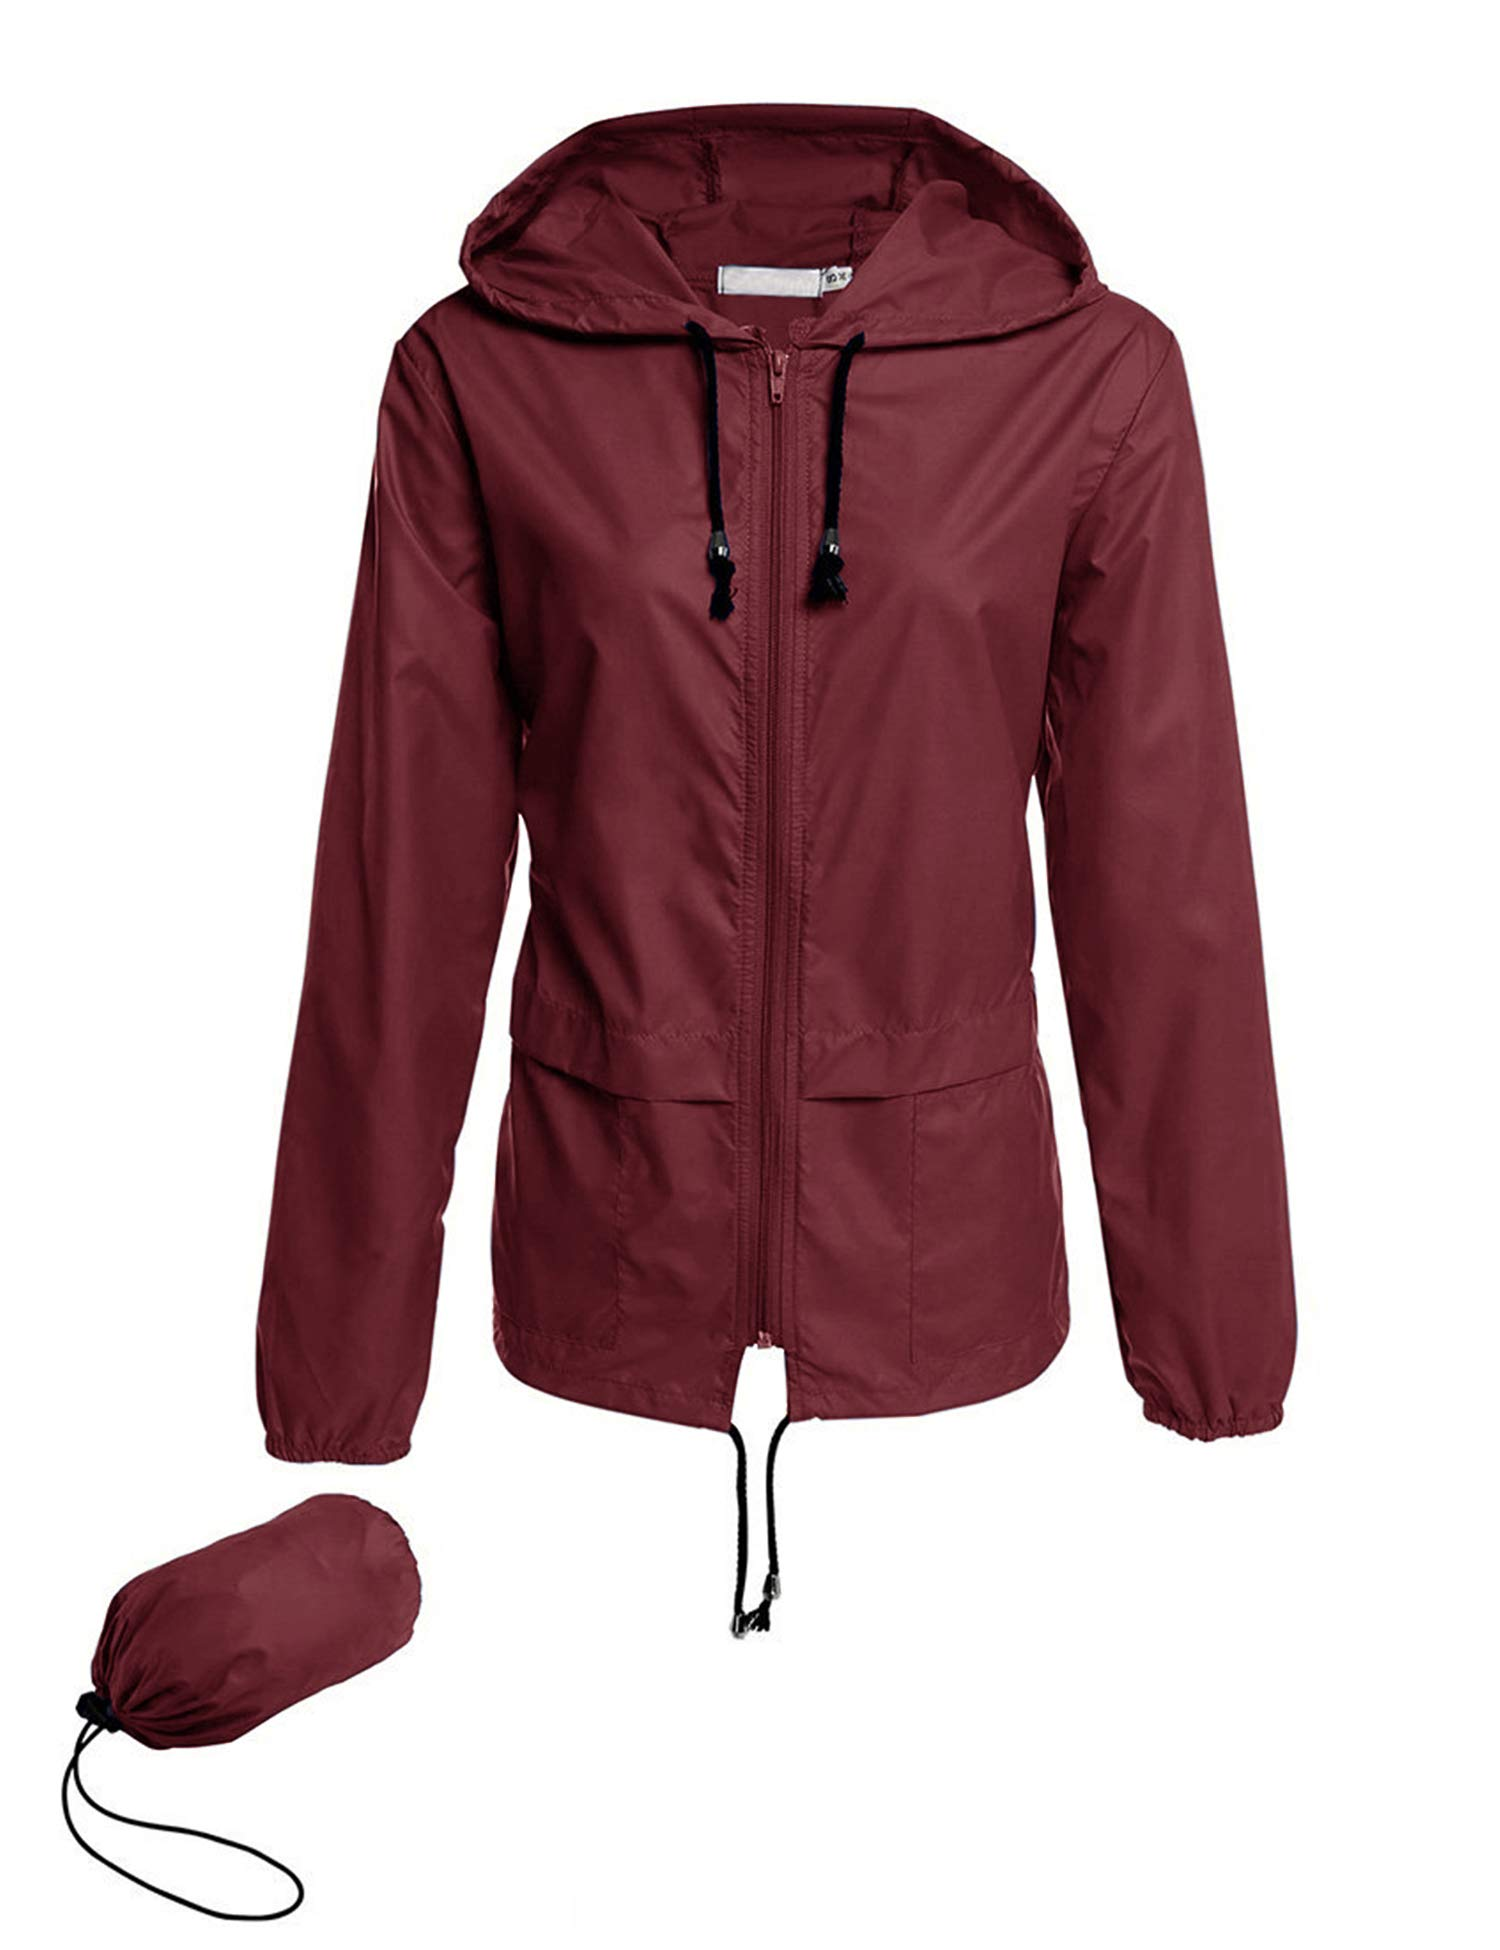 Avoogue Rain Jackets Women Lightweight Waterproof Raincoat Packable Outdoor Hooded Windbreaker Slim Fited Jackets(Wine Red S) by Avoogue